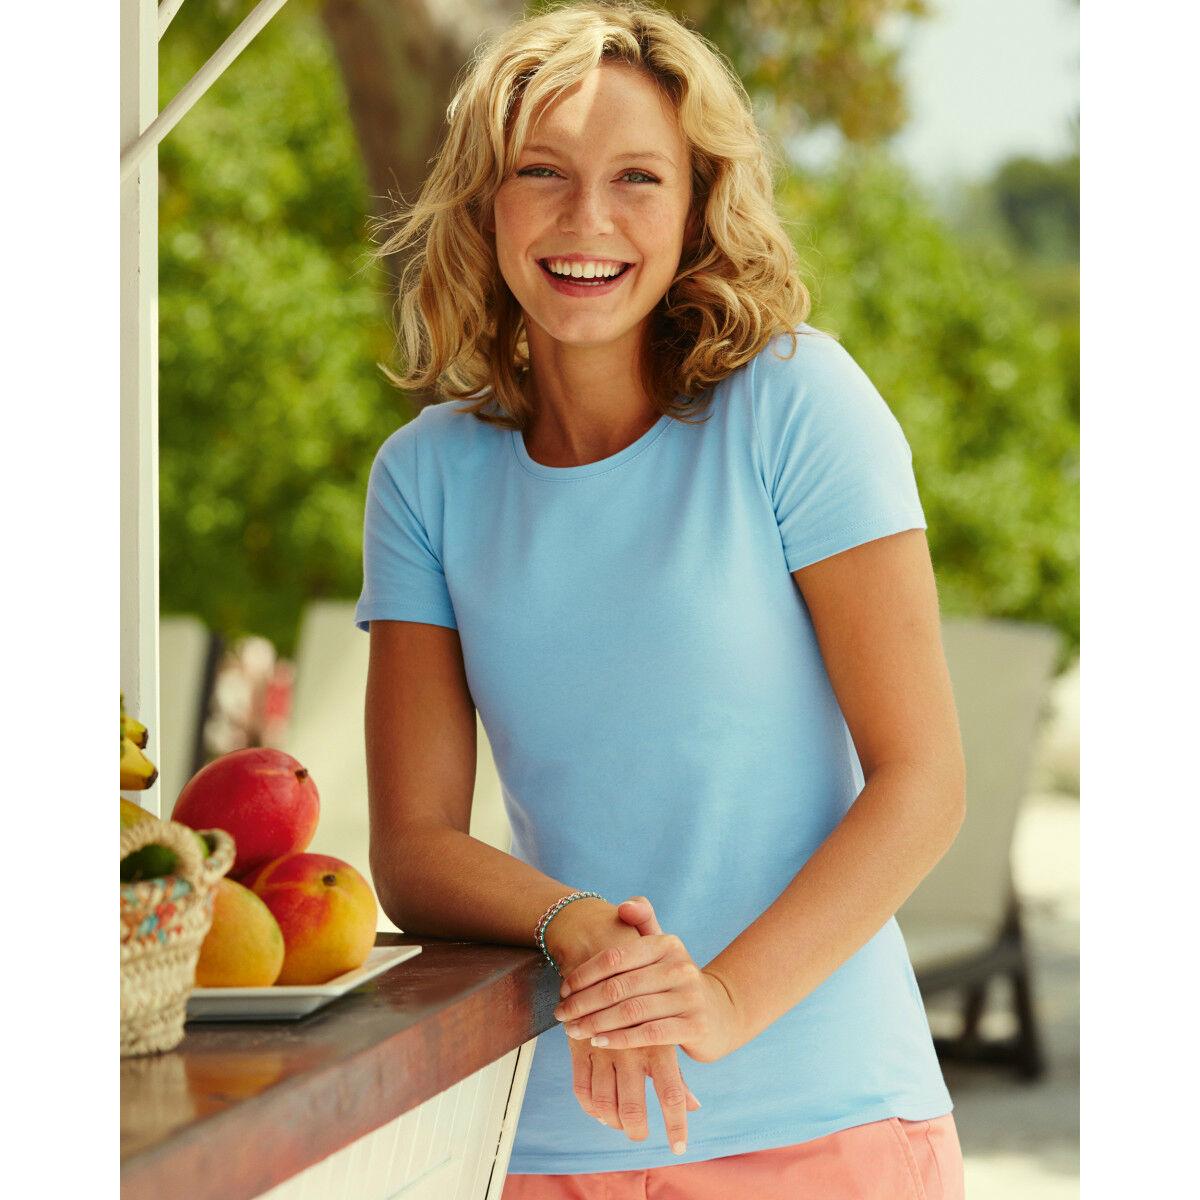 Fruit of the Loom Ladyfit T-Shirt - Sky Blue